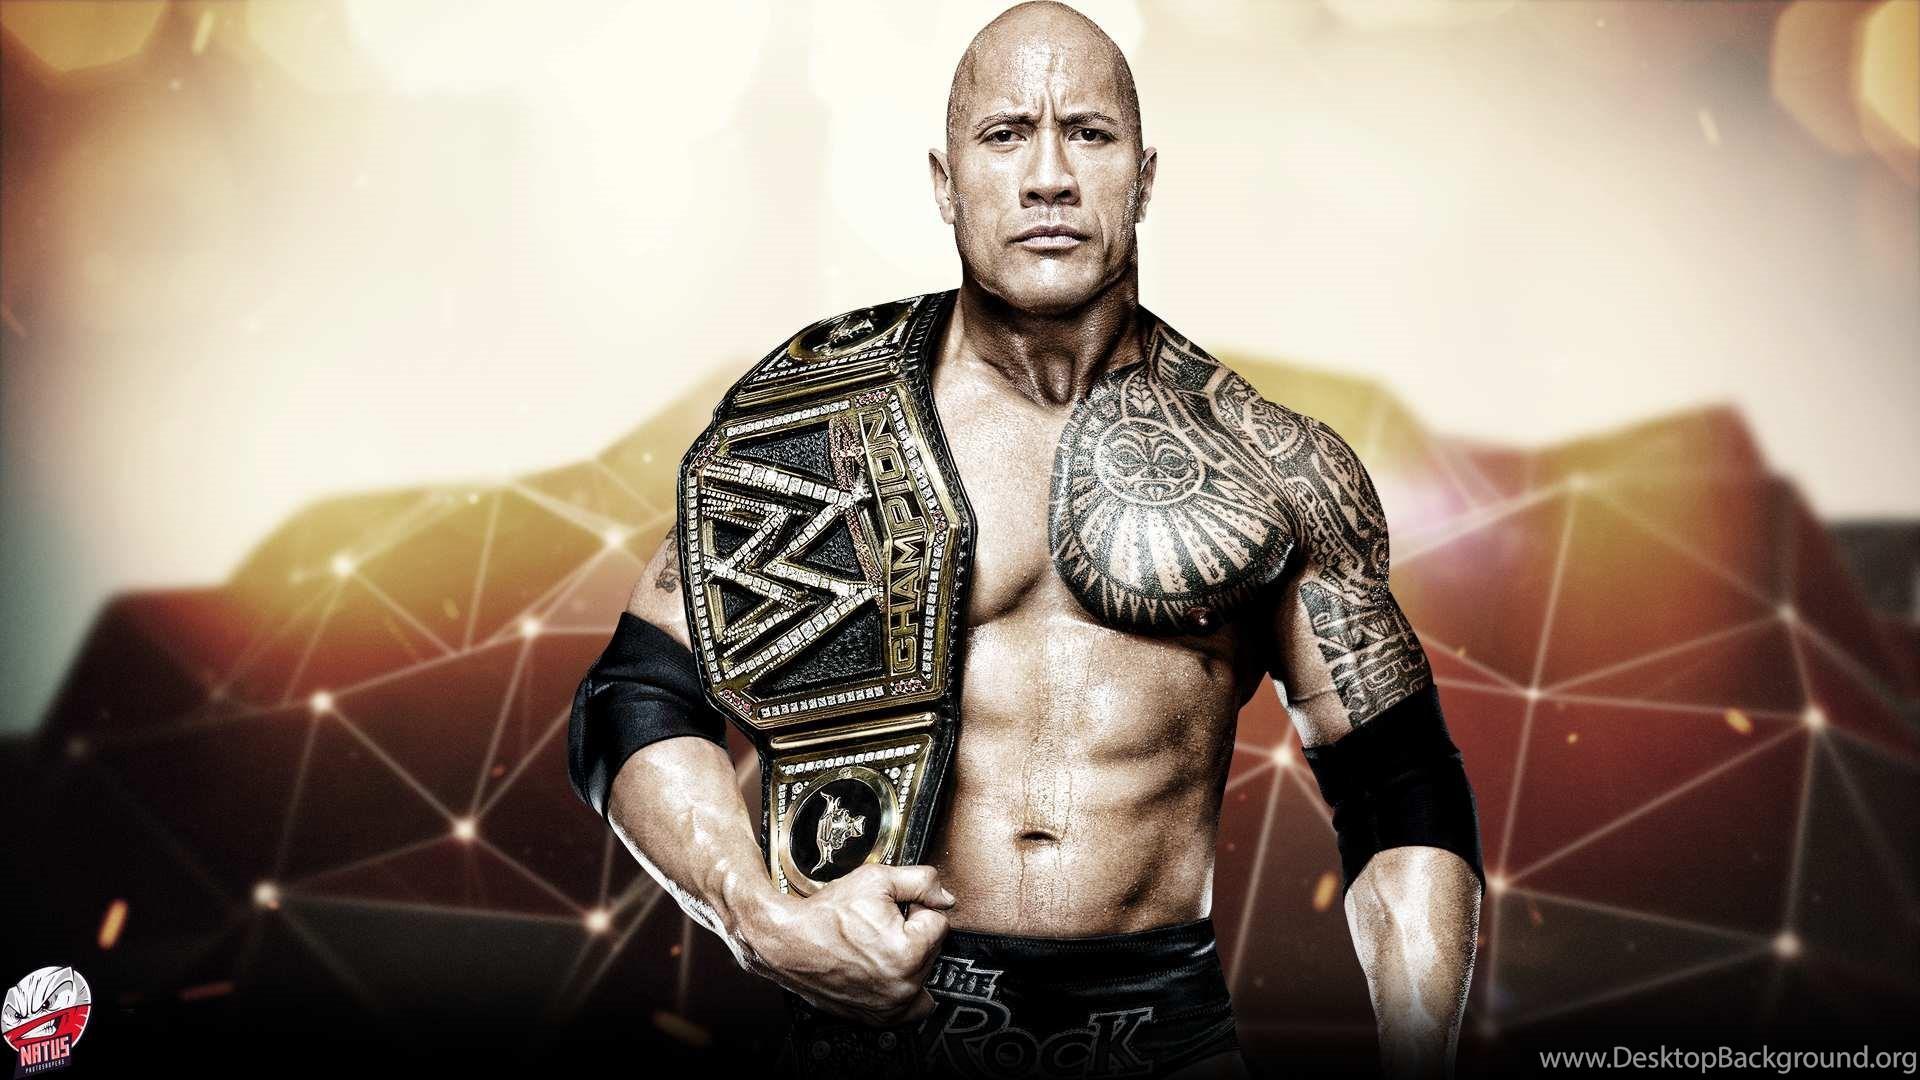 WWE The Rock Dwayne Johnson HD Wallpapers For Desktop Background